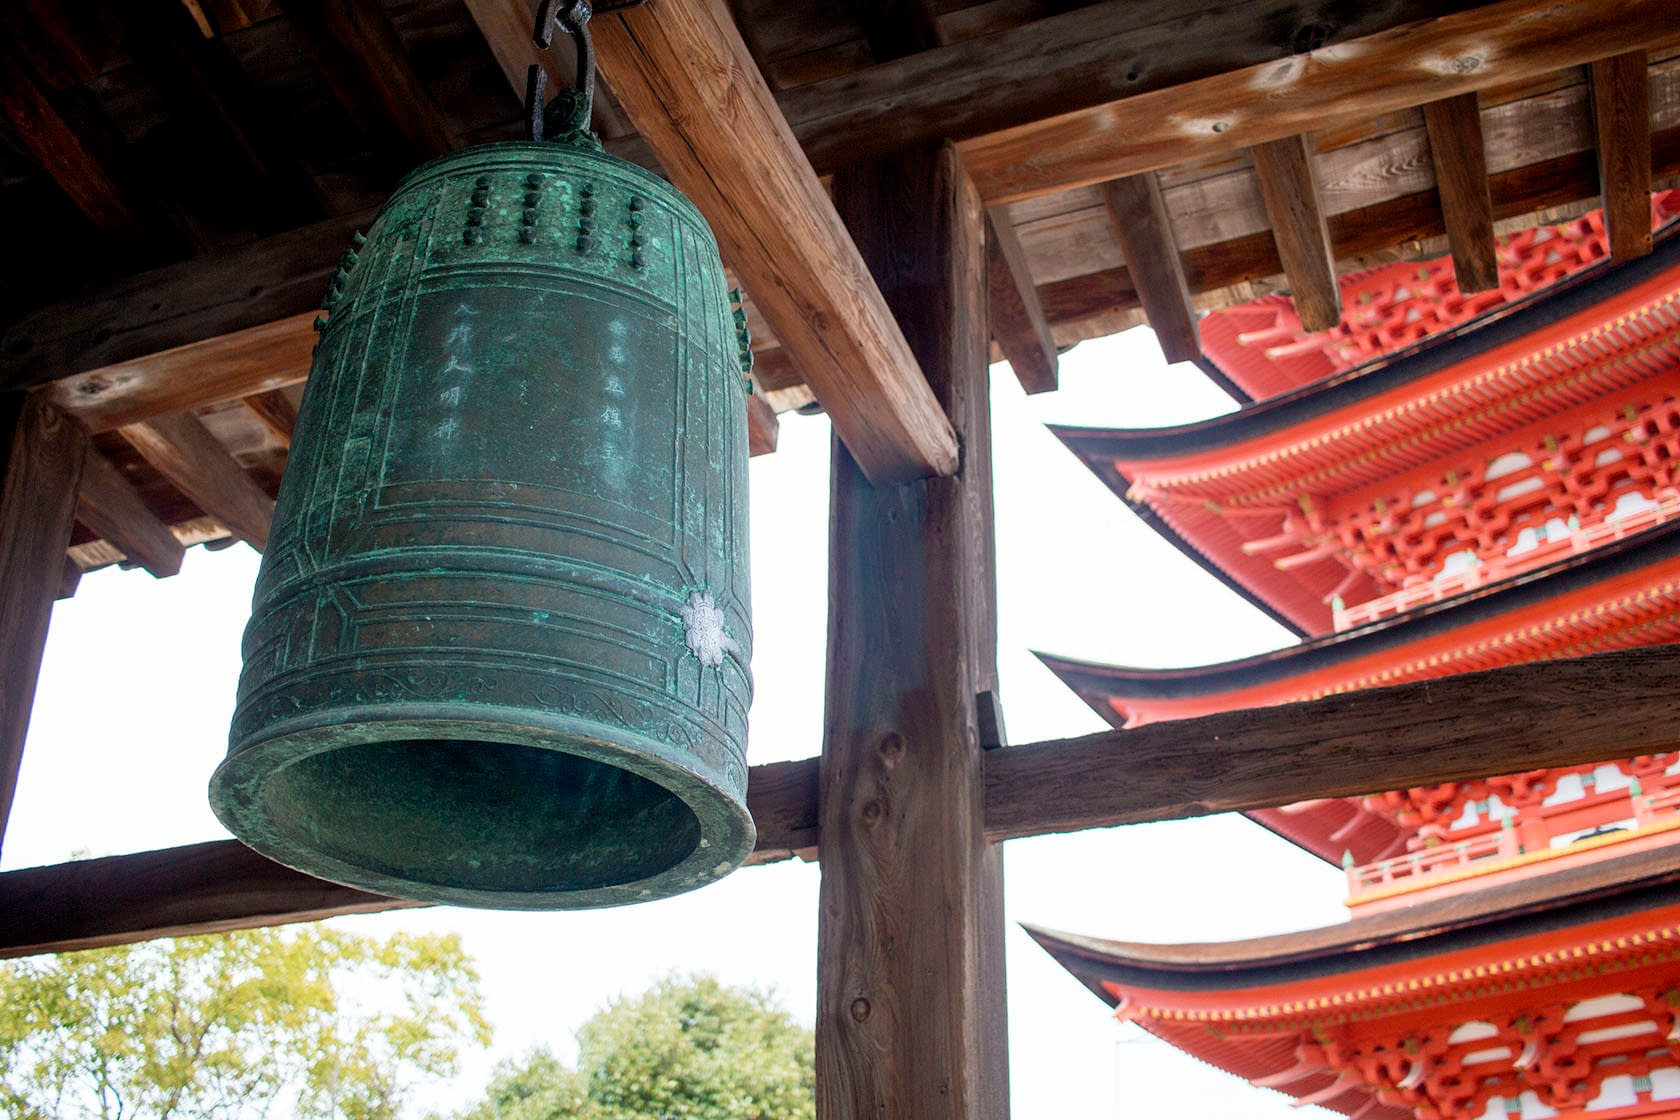 Temple Bell, Miyajima